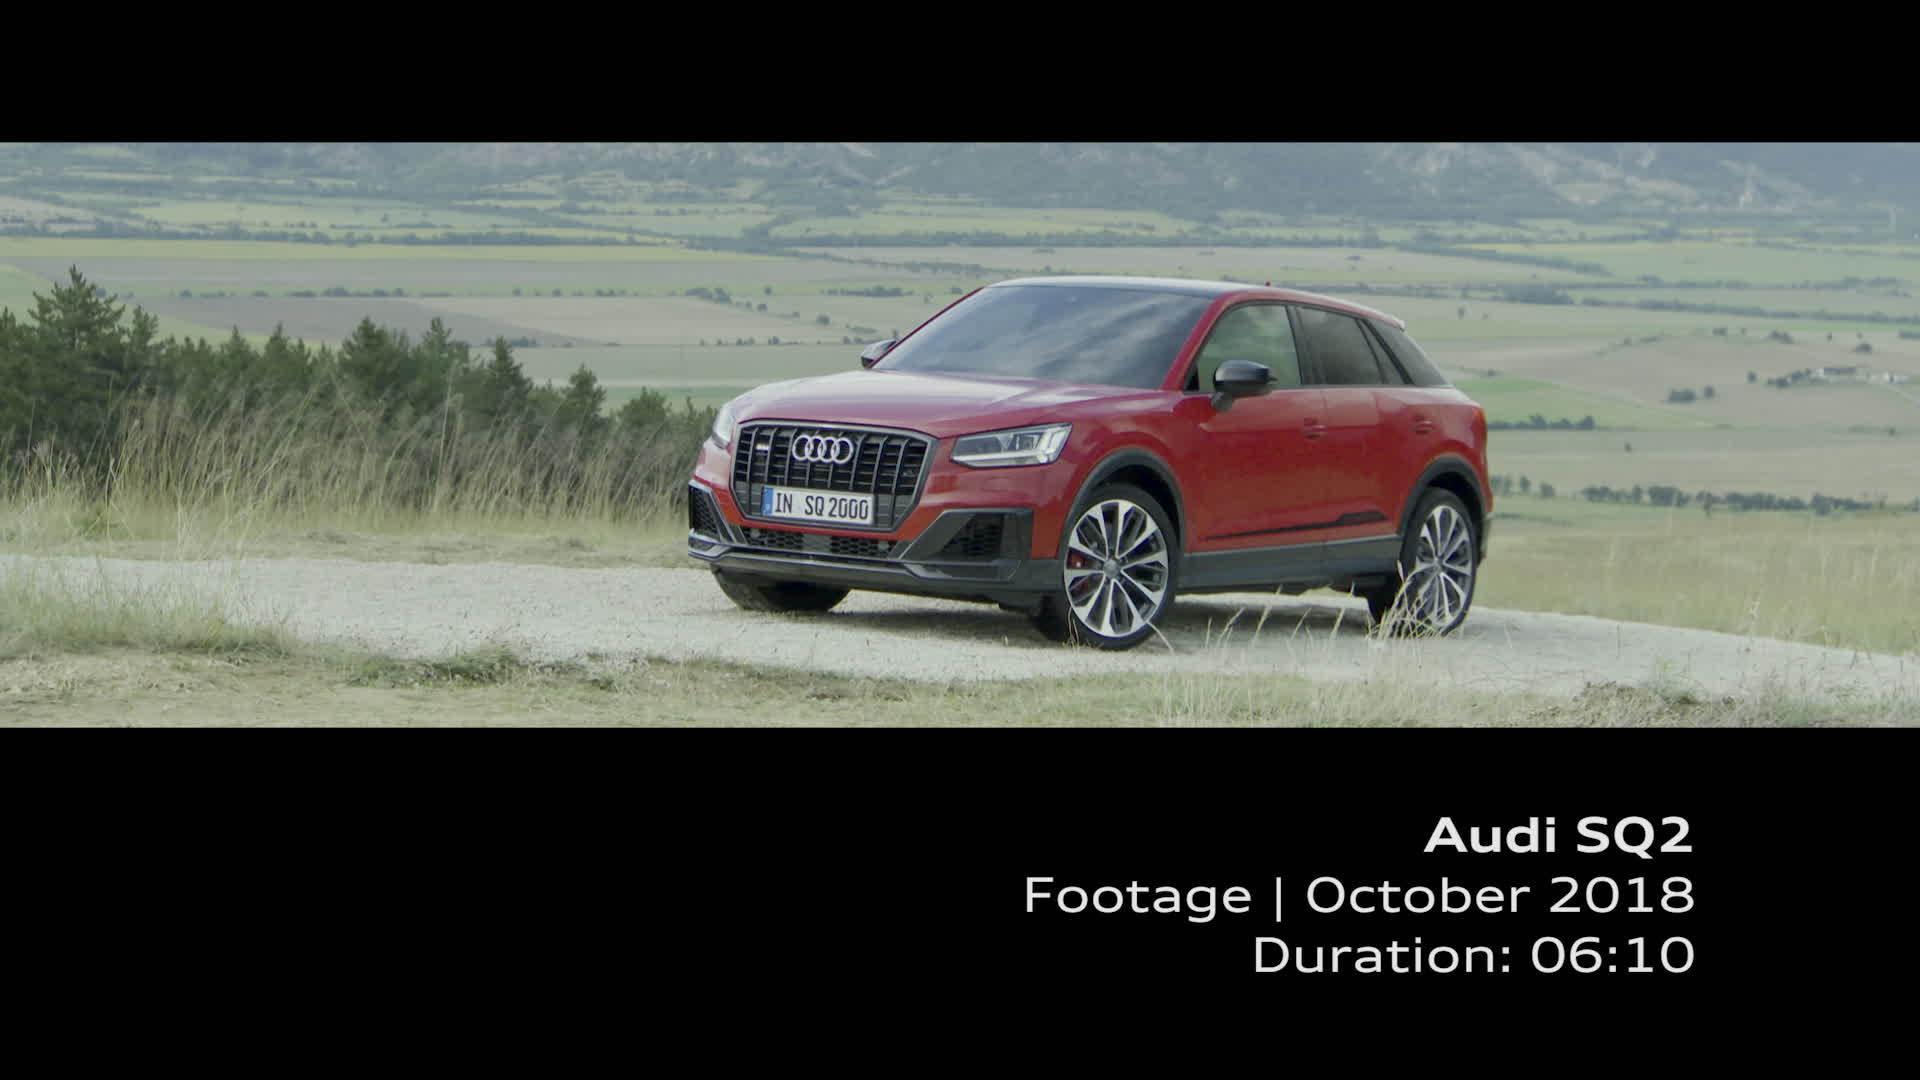 Audi SQ2 (Footage)